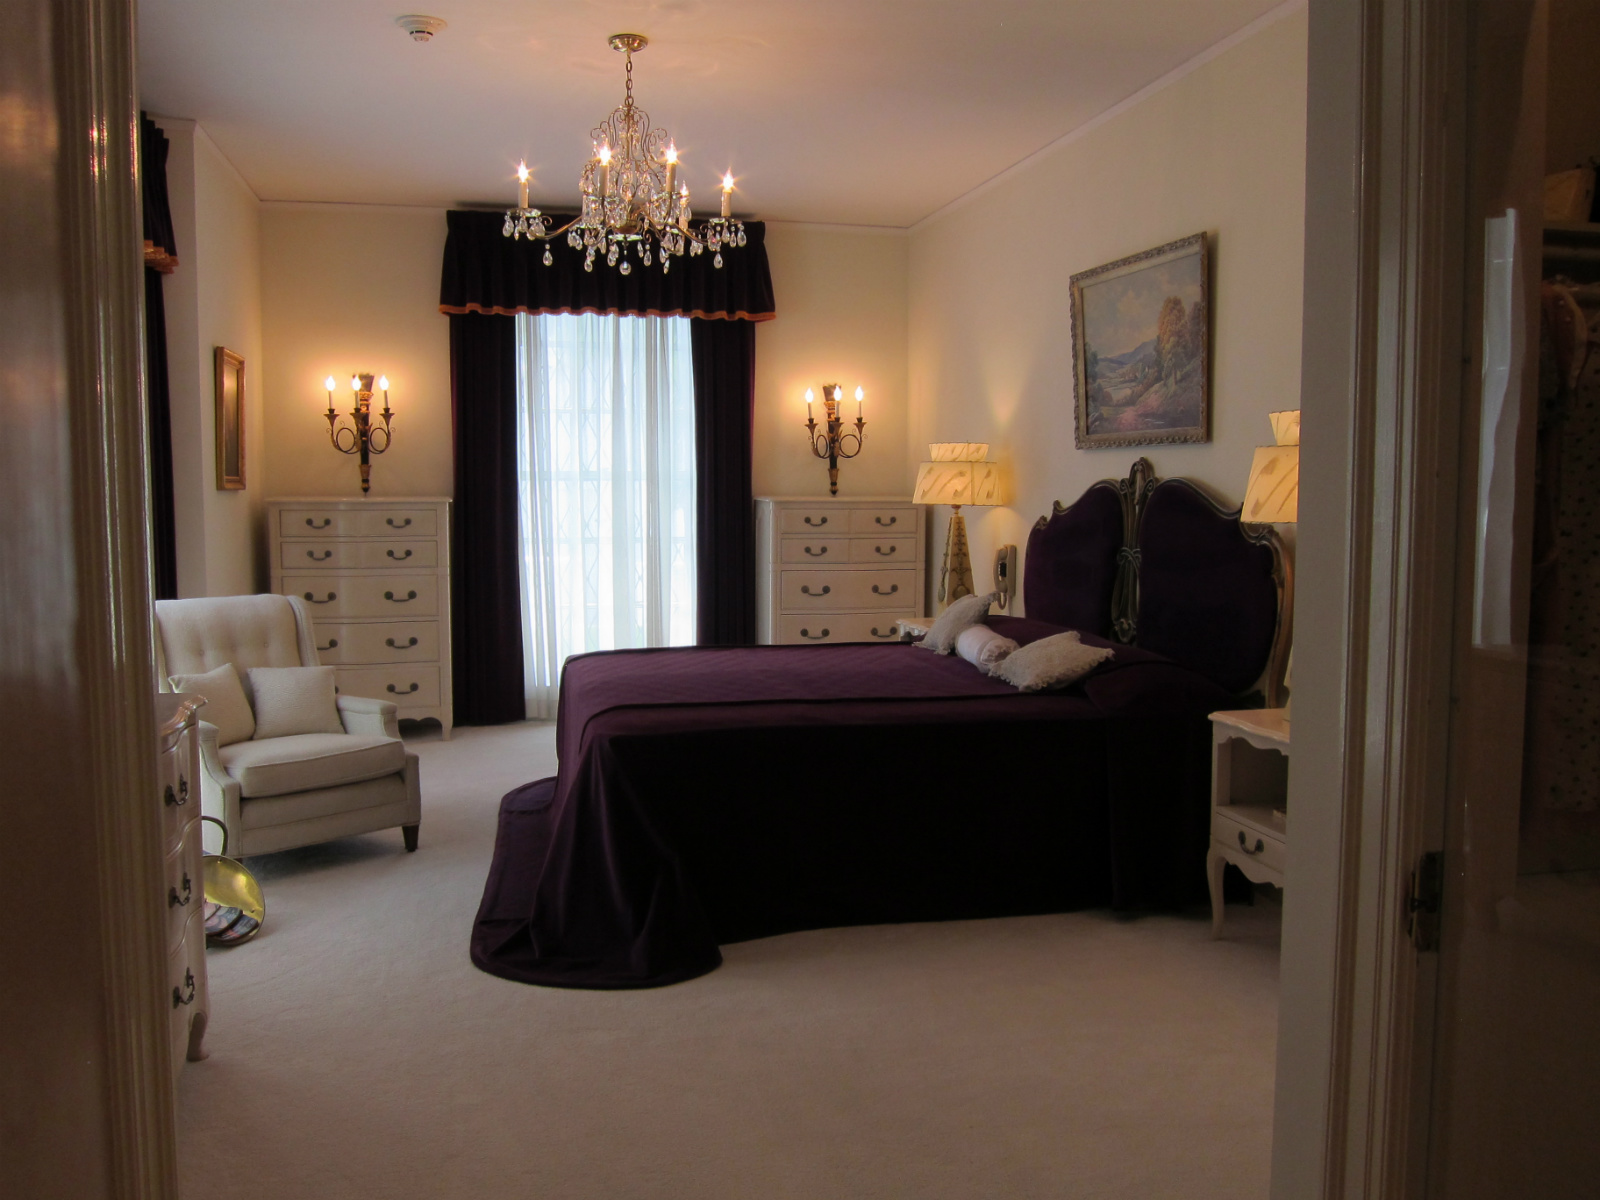 elvis presley bedroom at graceland